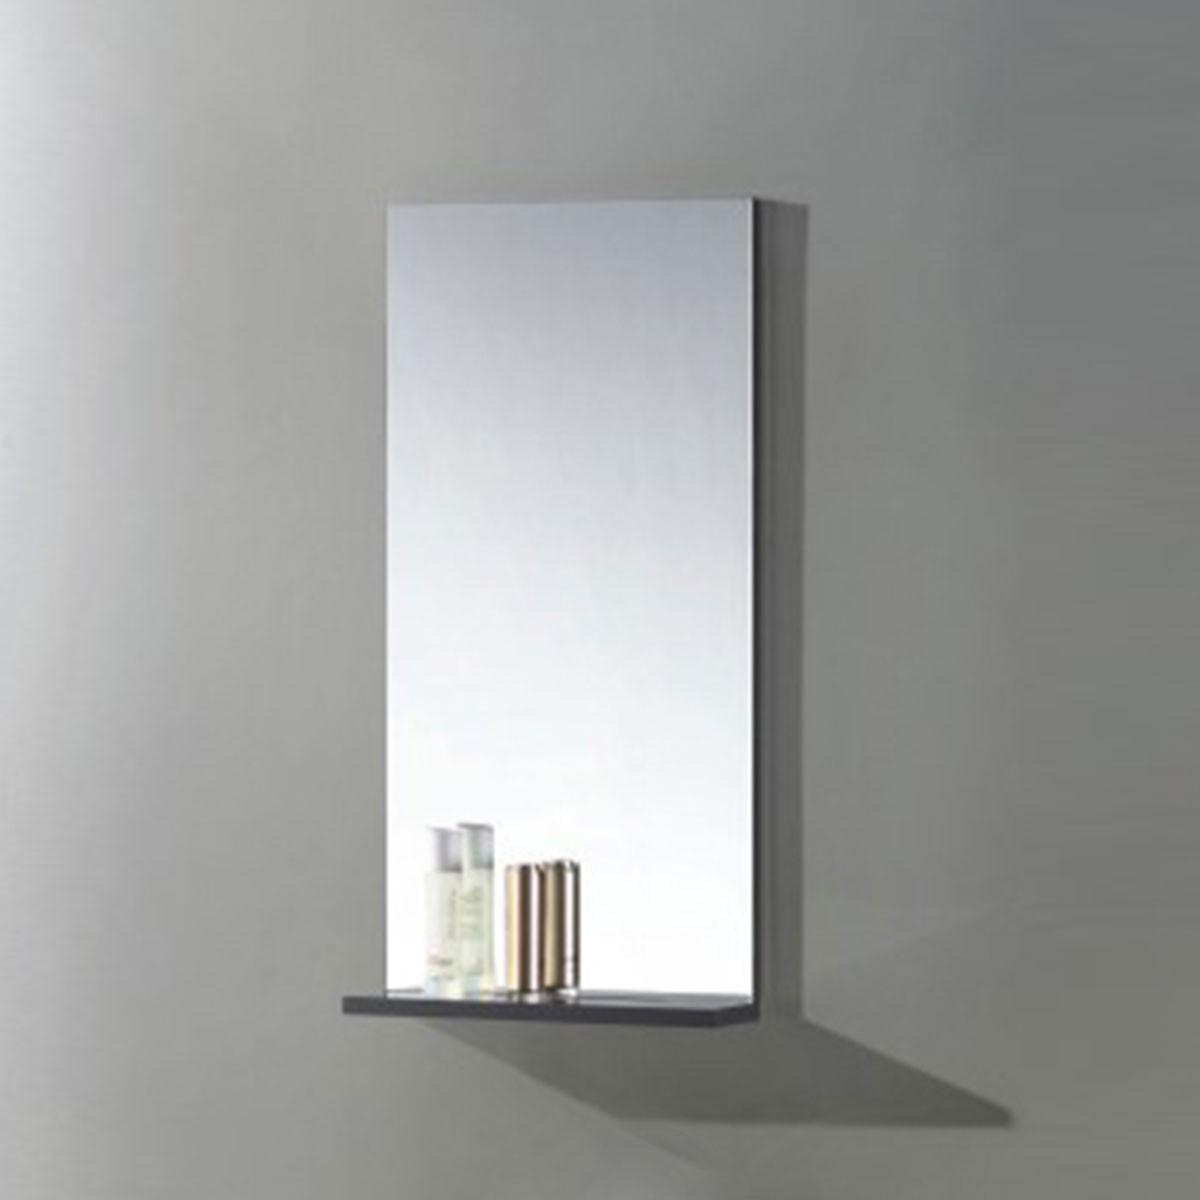 16 x 32 In. Bathroom Mirror with Shelf (MS400C-M)